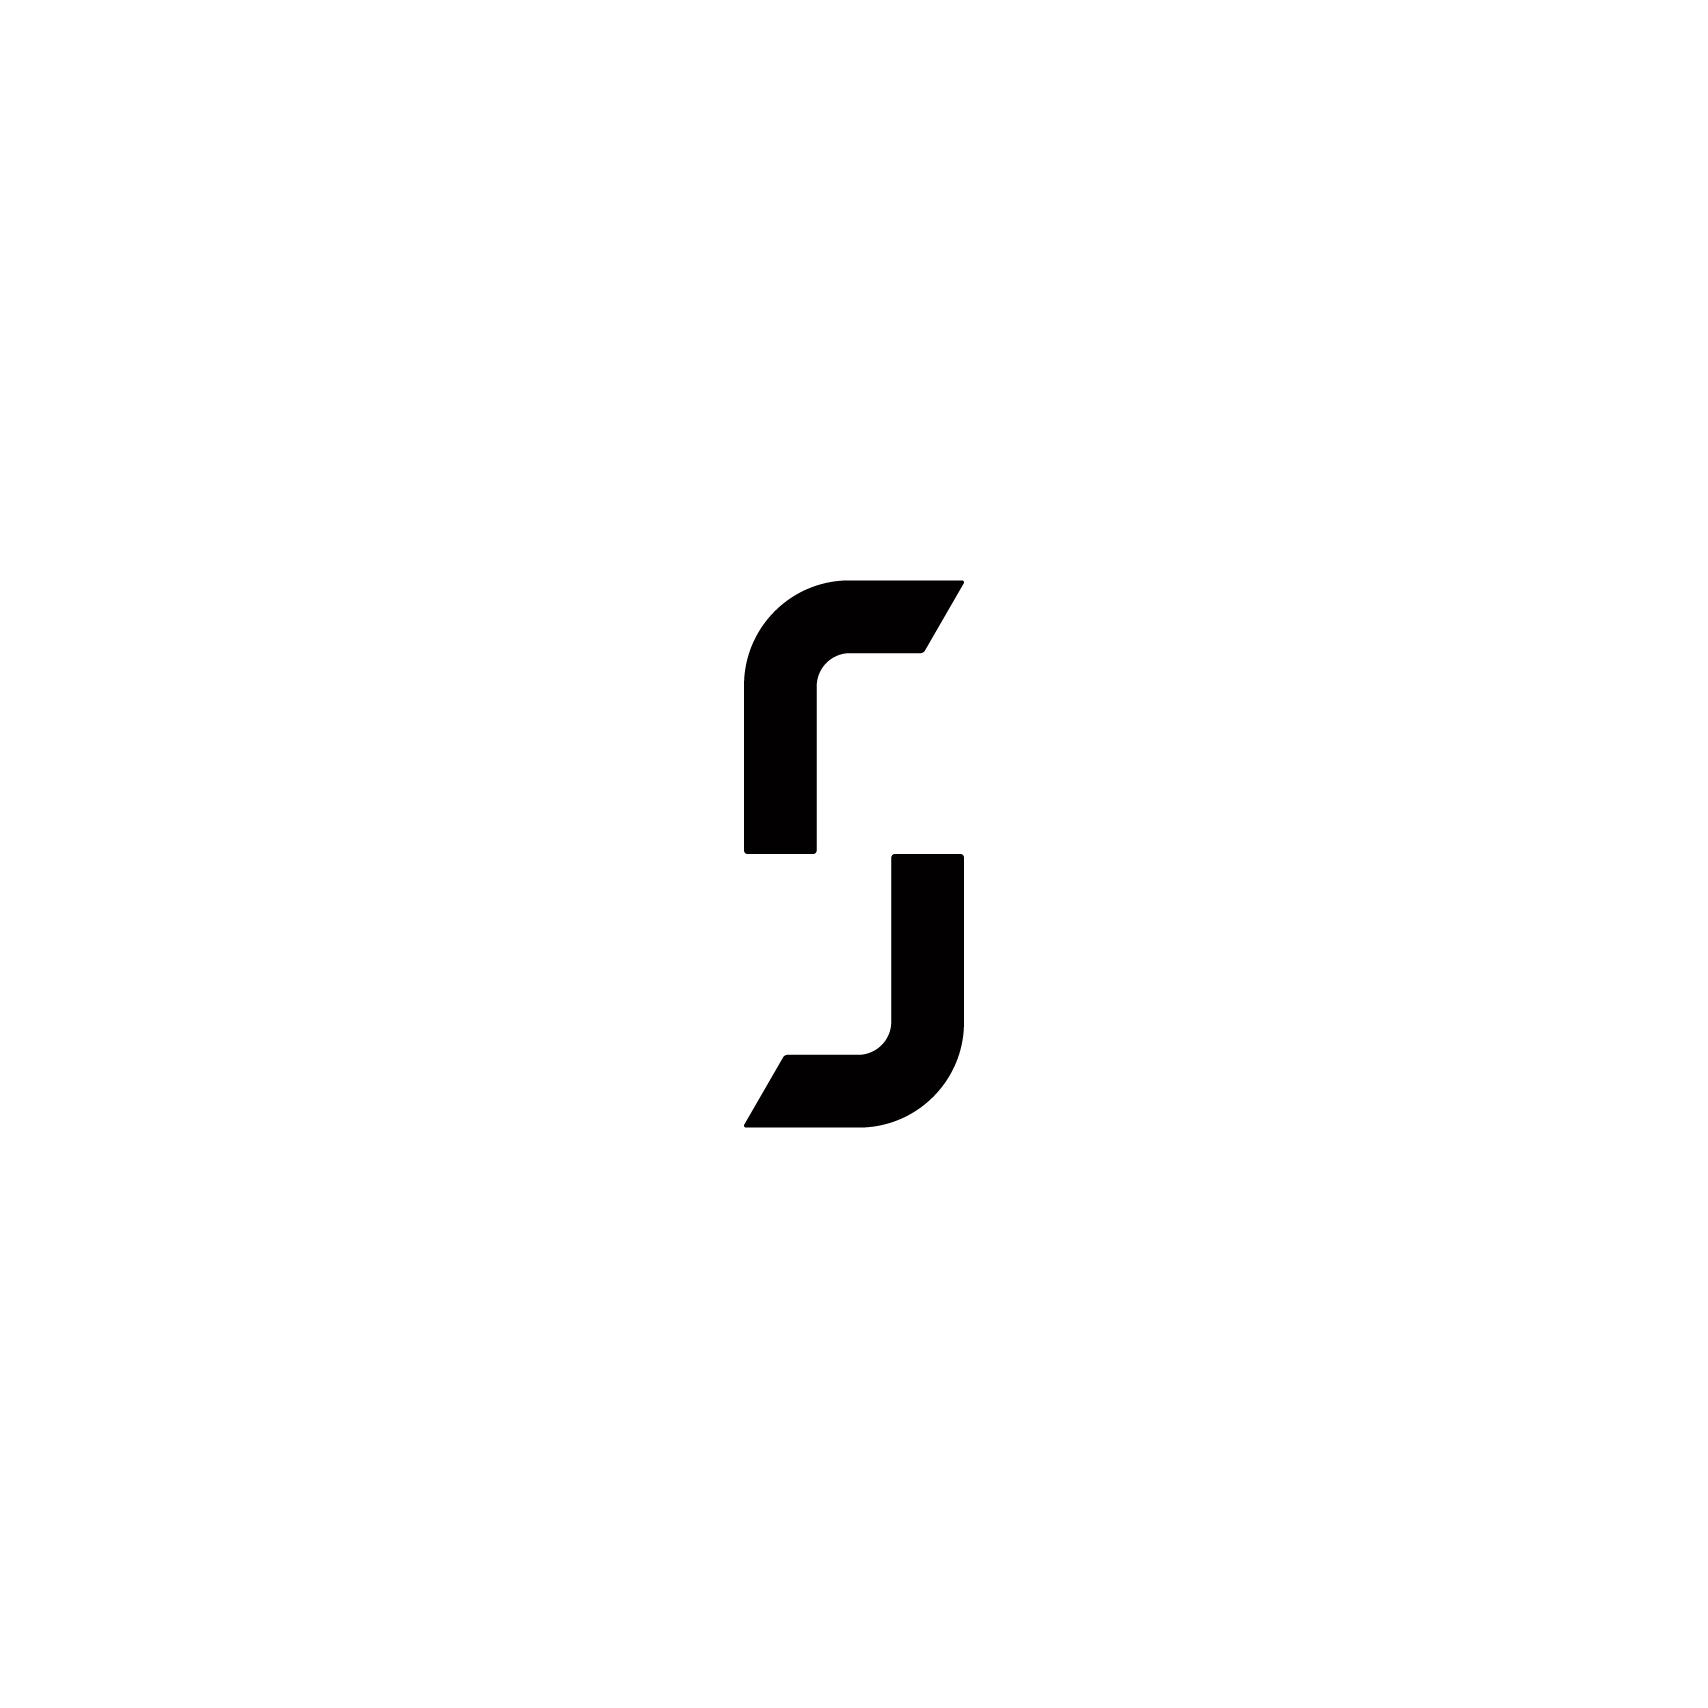 MlleRouge_logos_RobertJSands